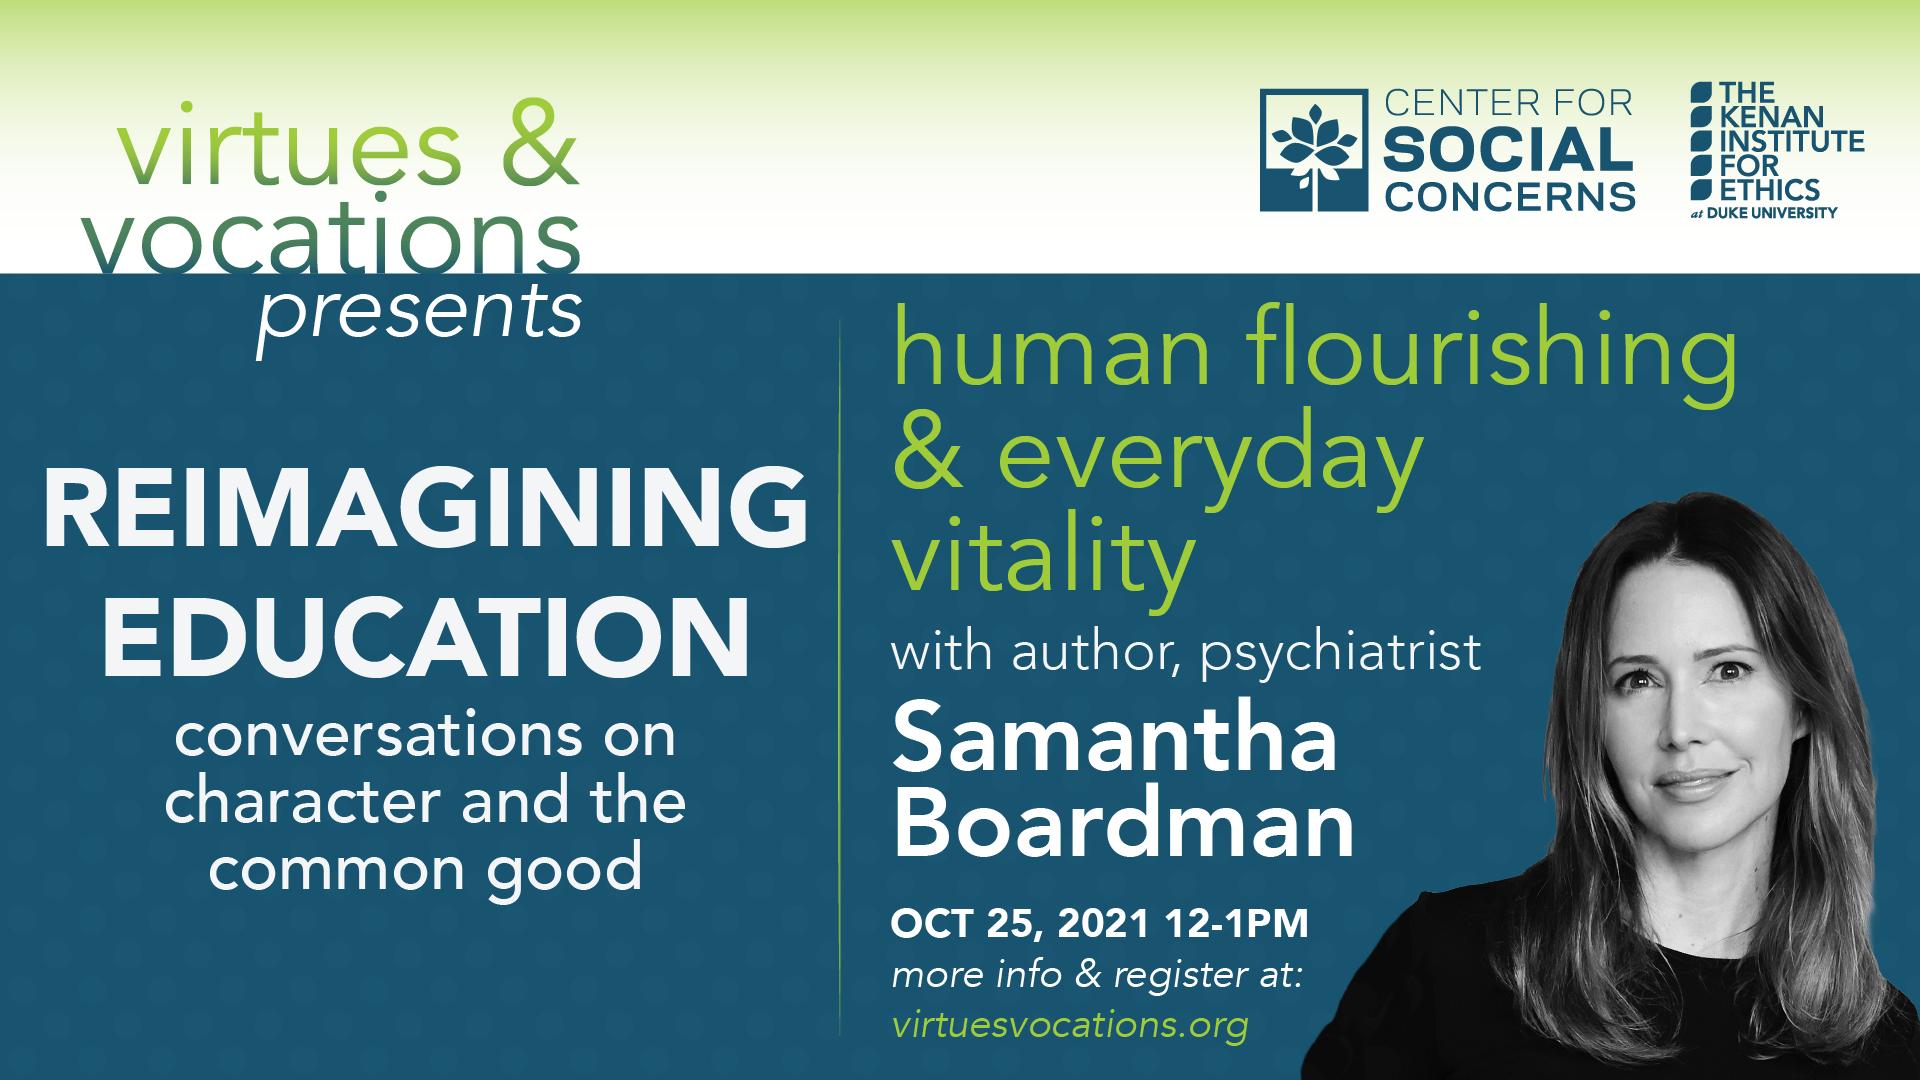 Virtues & Vocations presents Samantha Boardman